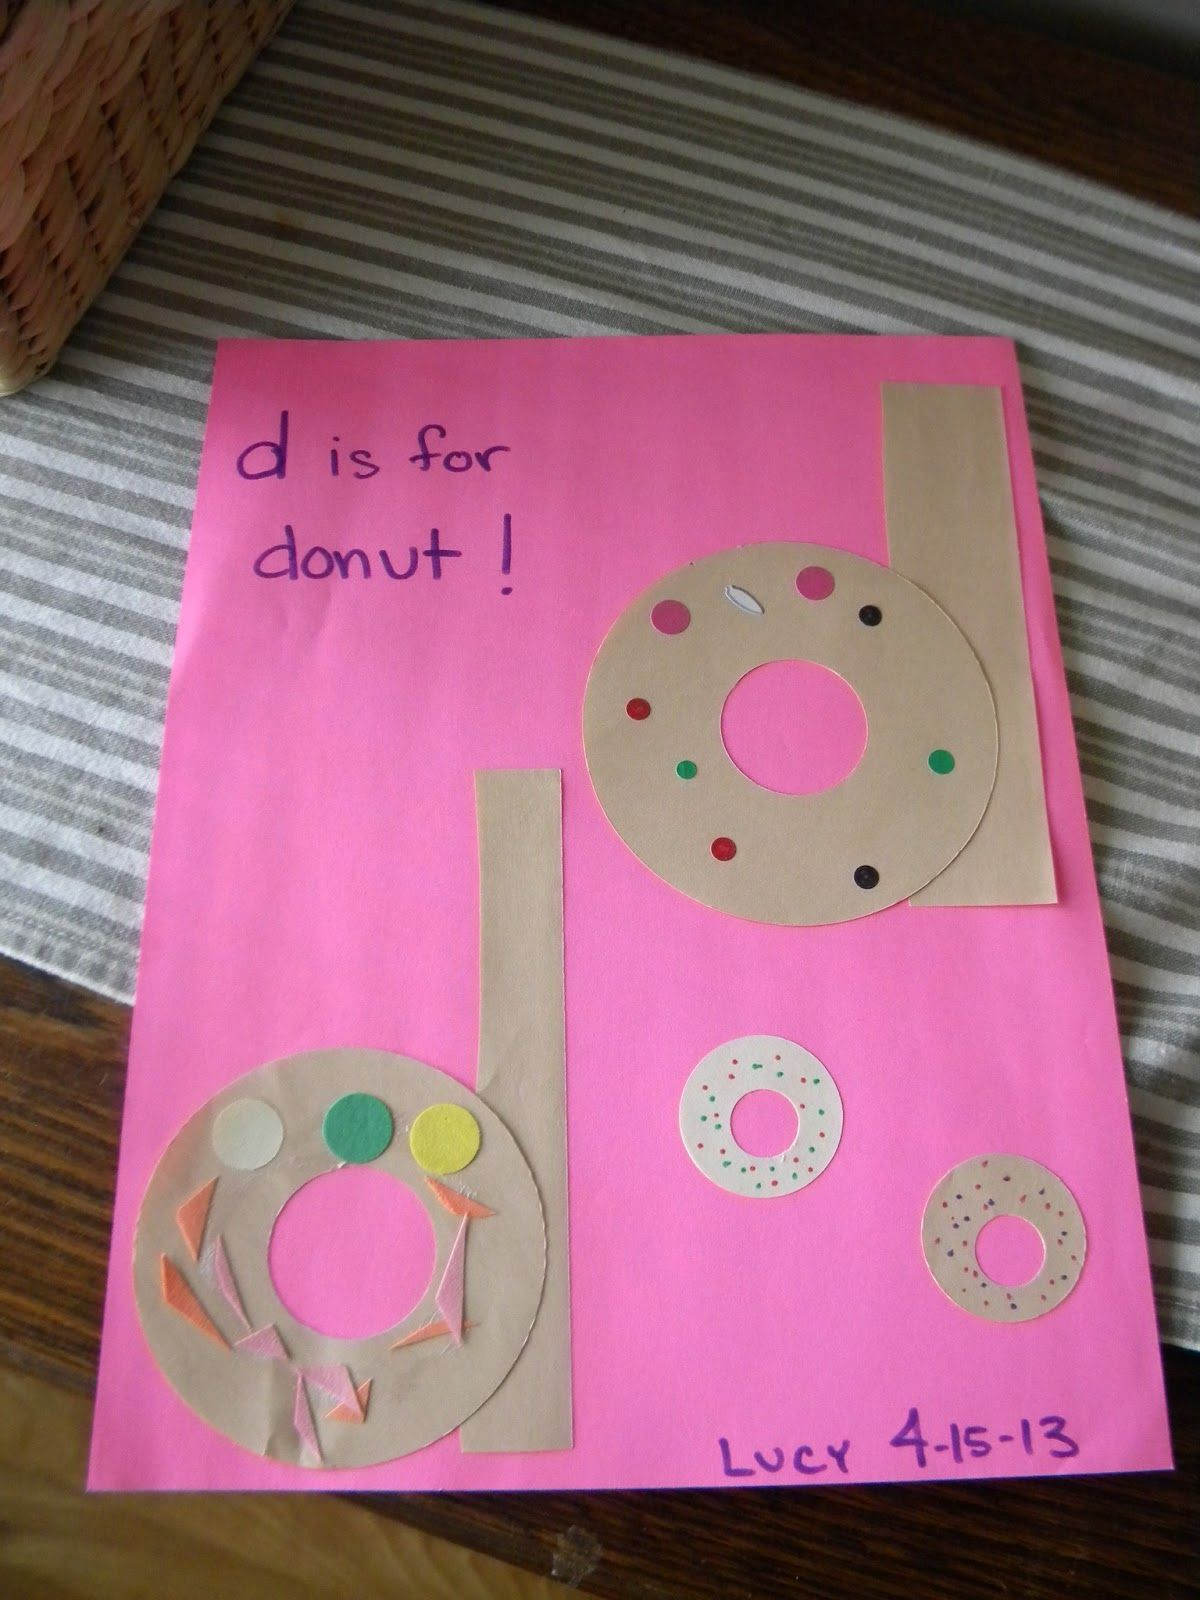 D is for donut | Alphabet Ideas in 2018 | Pinterest | Donuts, Letter ...